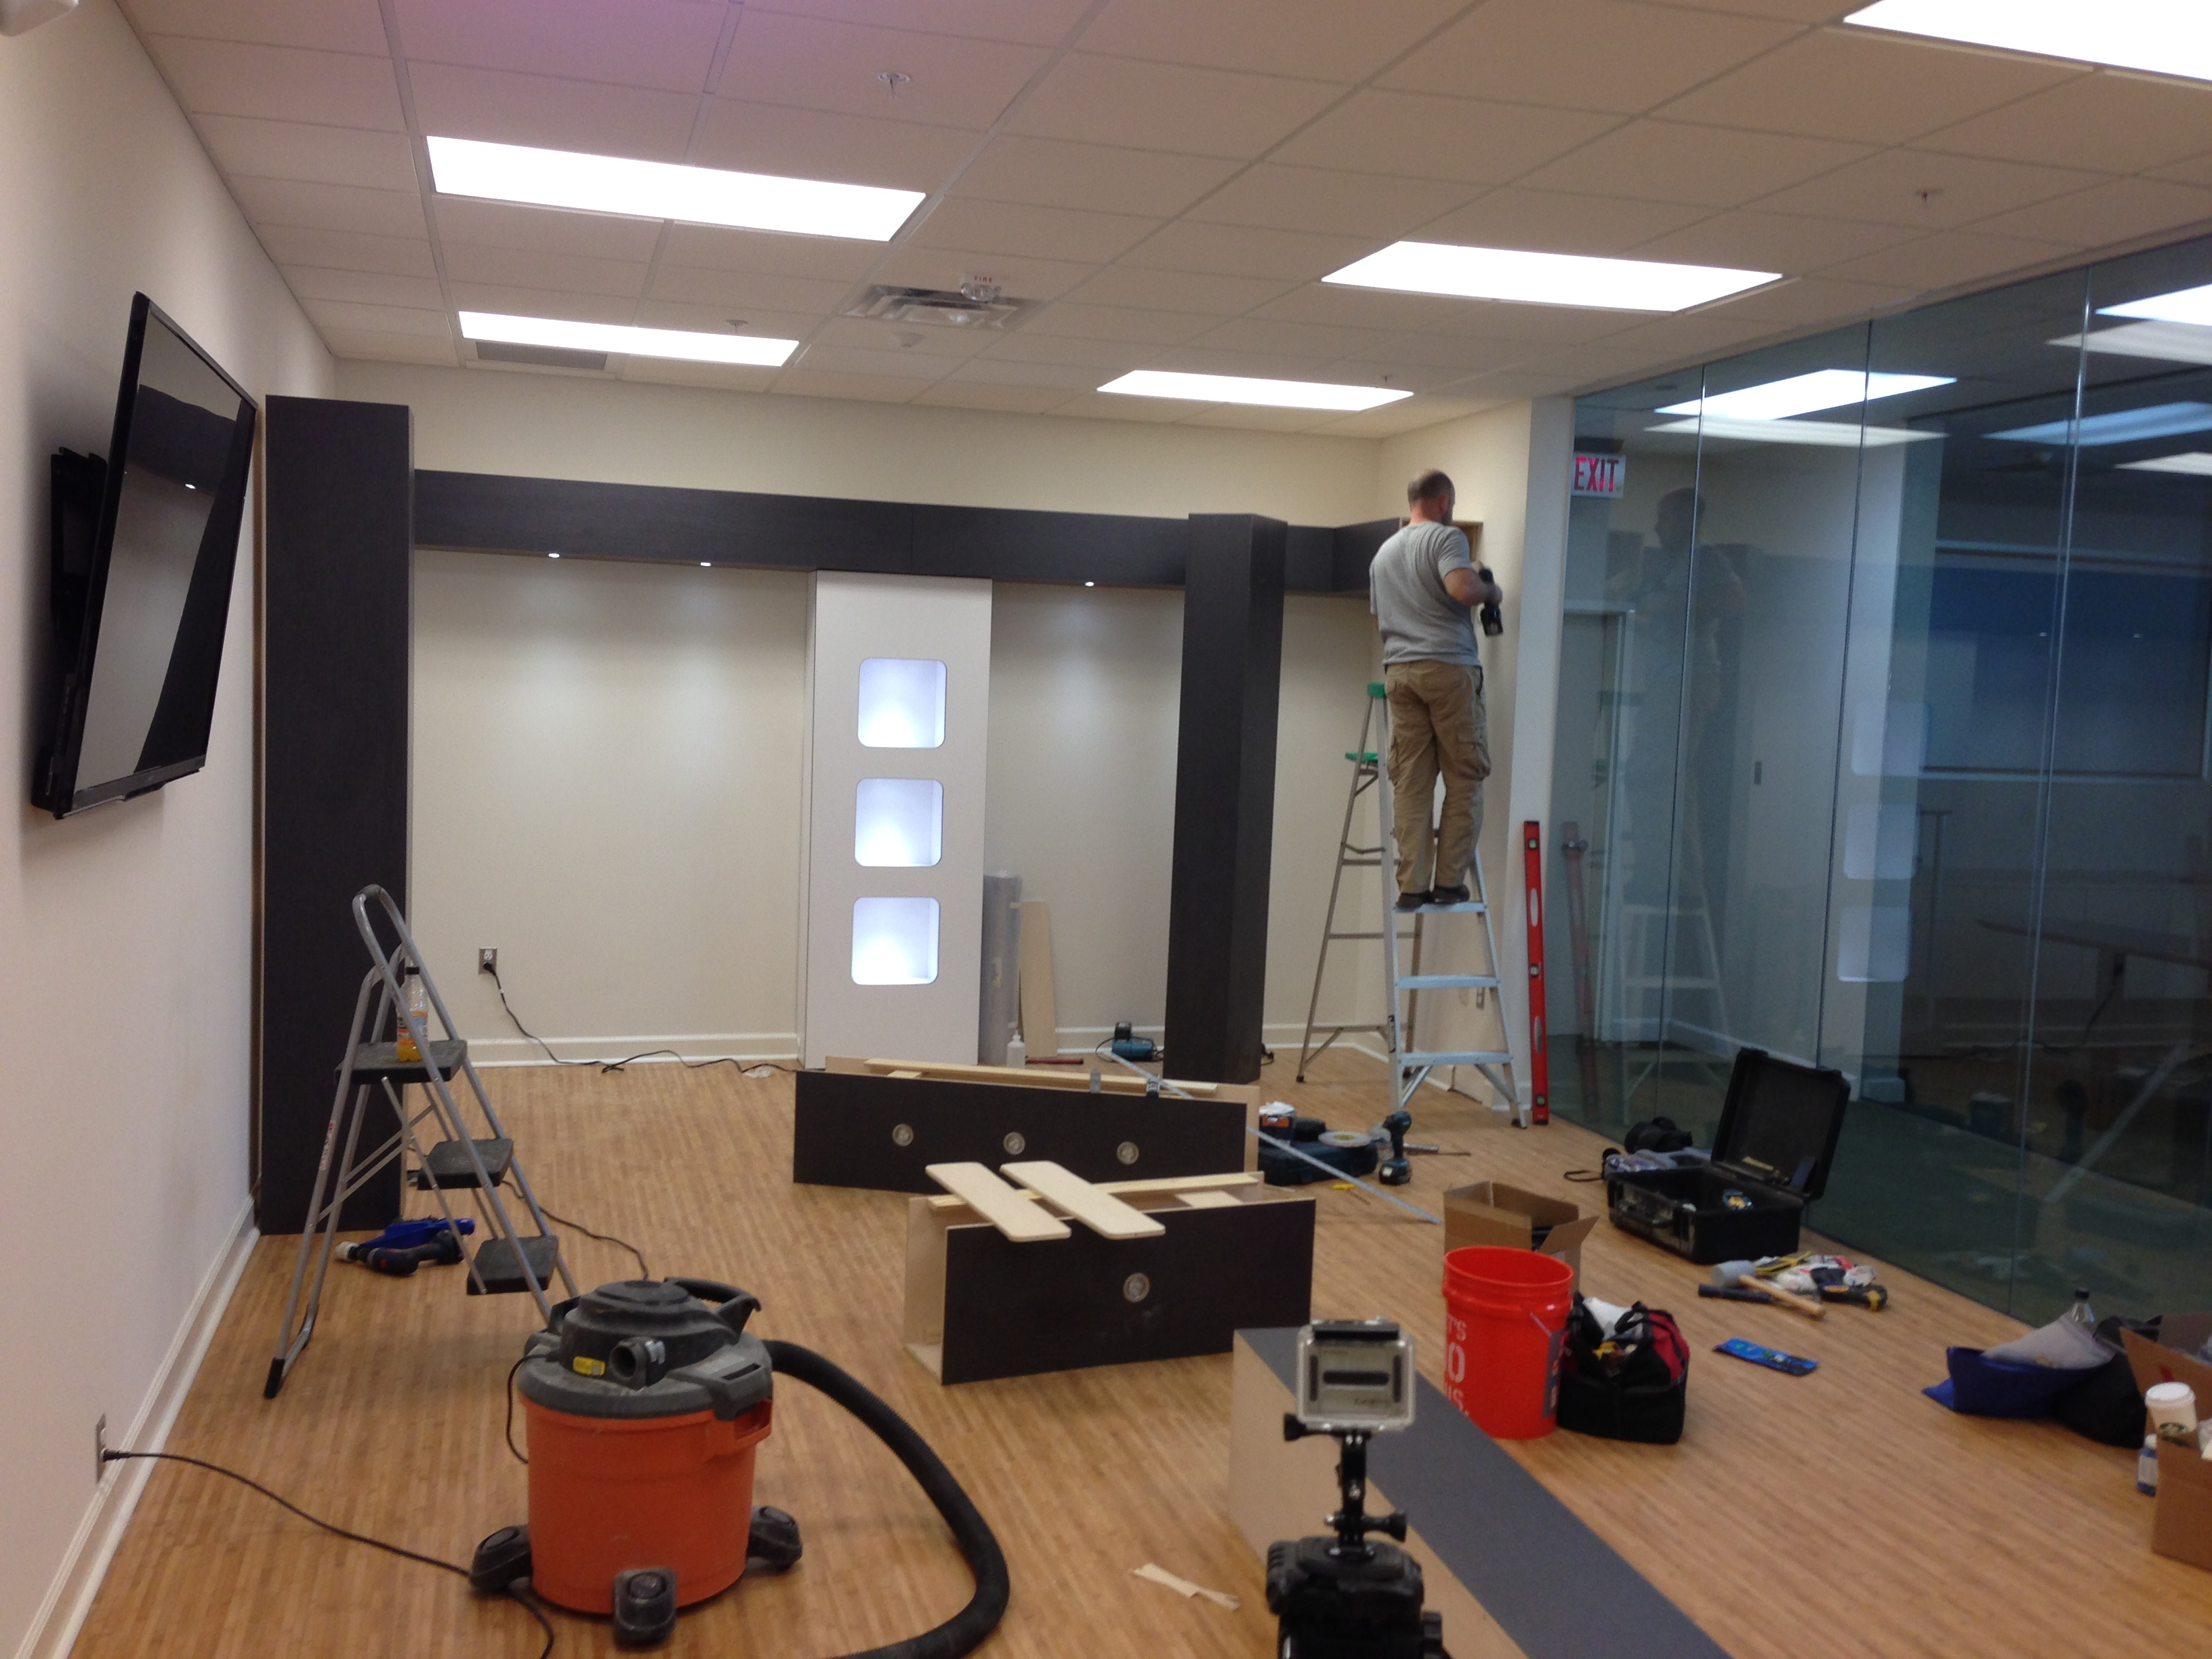 Showroom Installation in Progress...